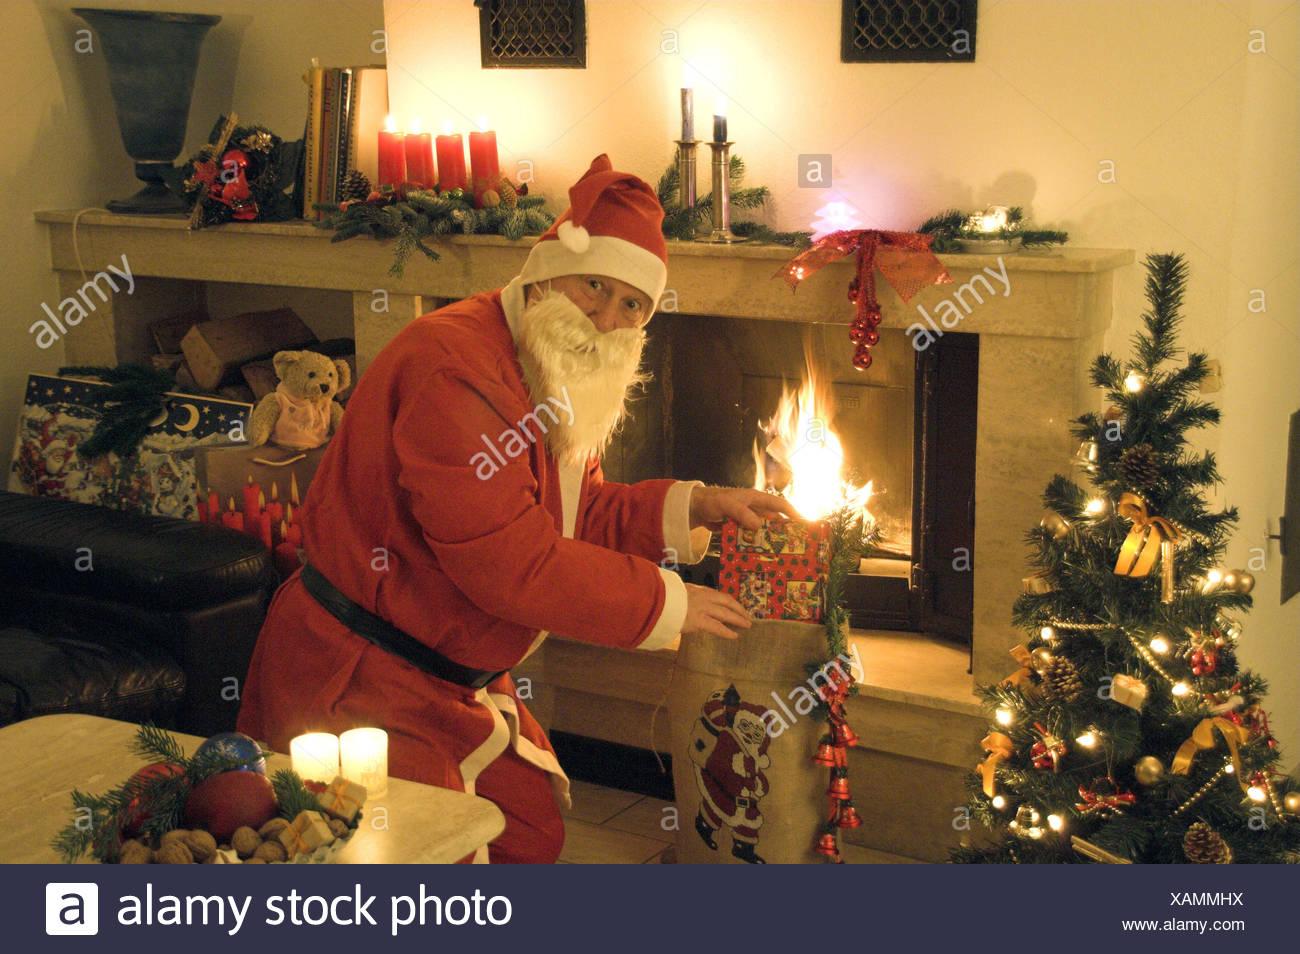 fireplace christmas santa claus chimney stock photos fireplace